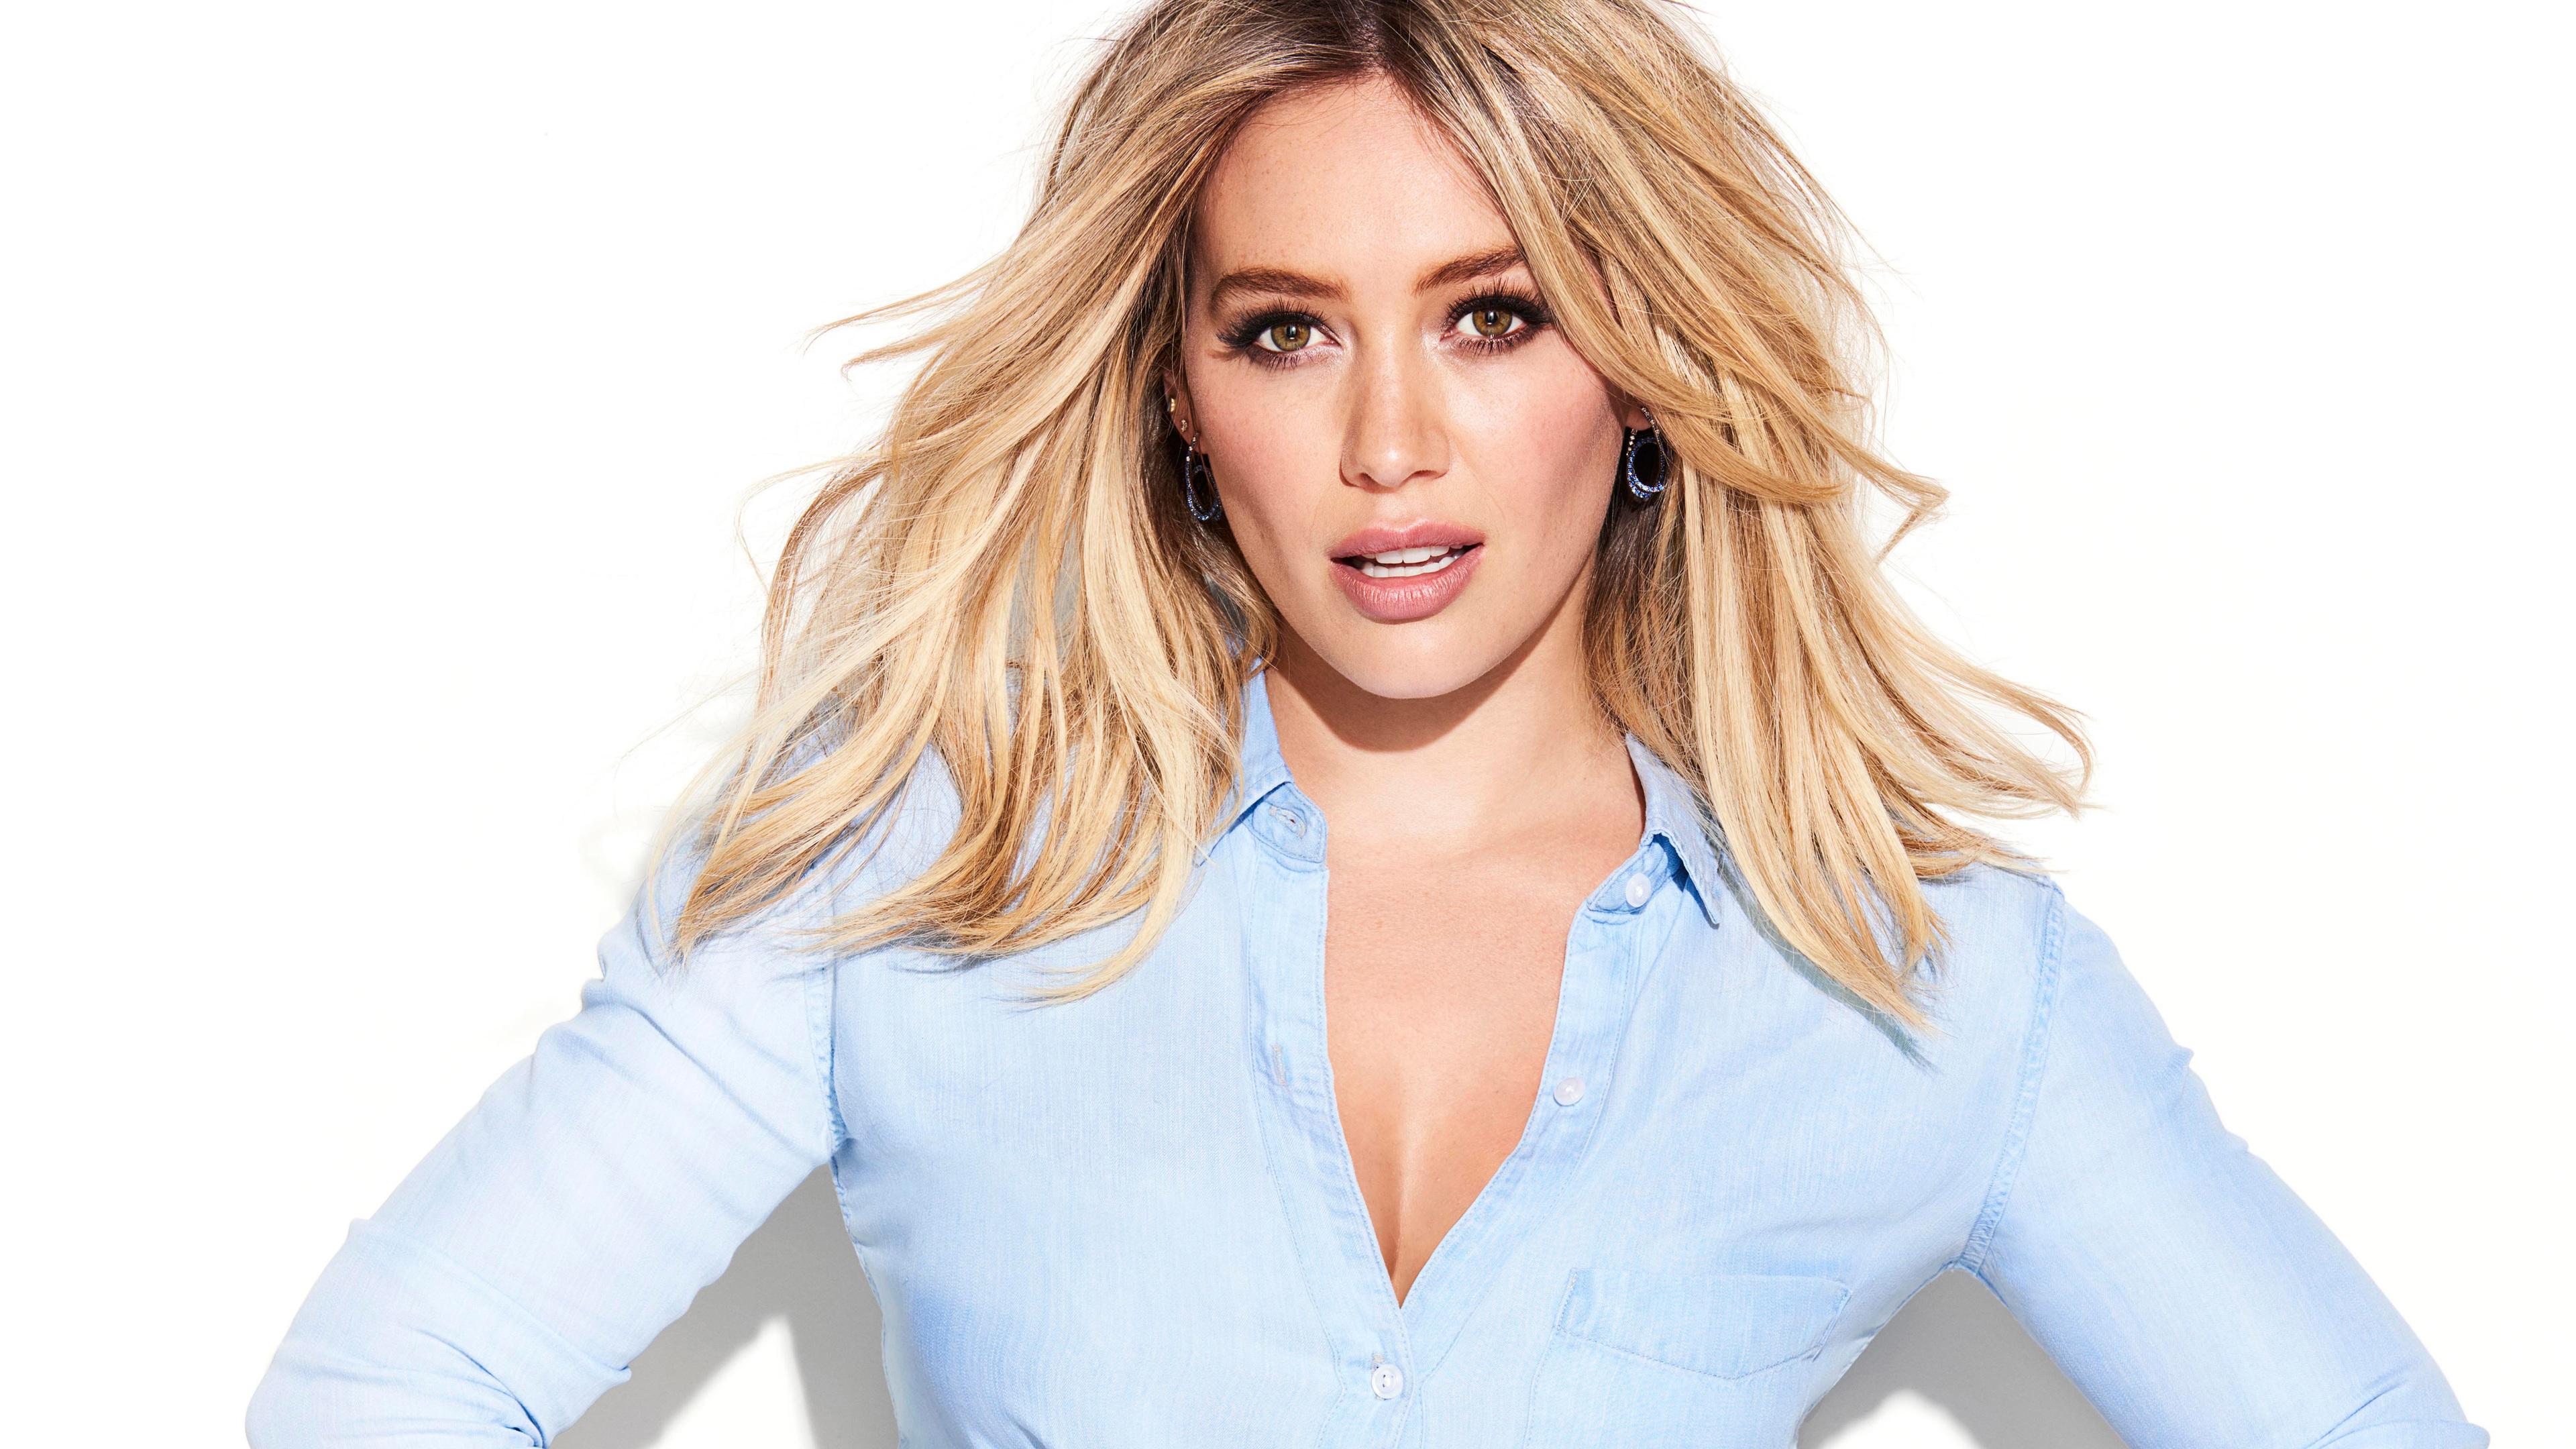 hilary duff cosmopolitan 2018 1536861450 - Hilary Duff Cosmopolitan 2018 - hilary duff wallpapers, hd-wallpapers, girls wallpapers, celebrities wallpapers, 5k wallpapers, 4k-wallpapers